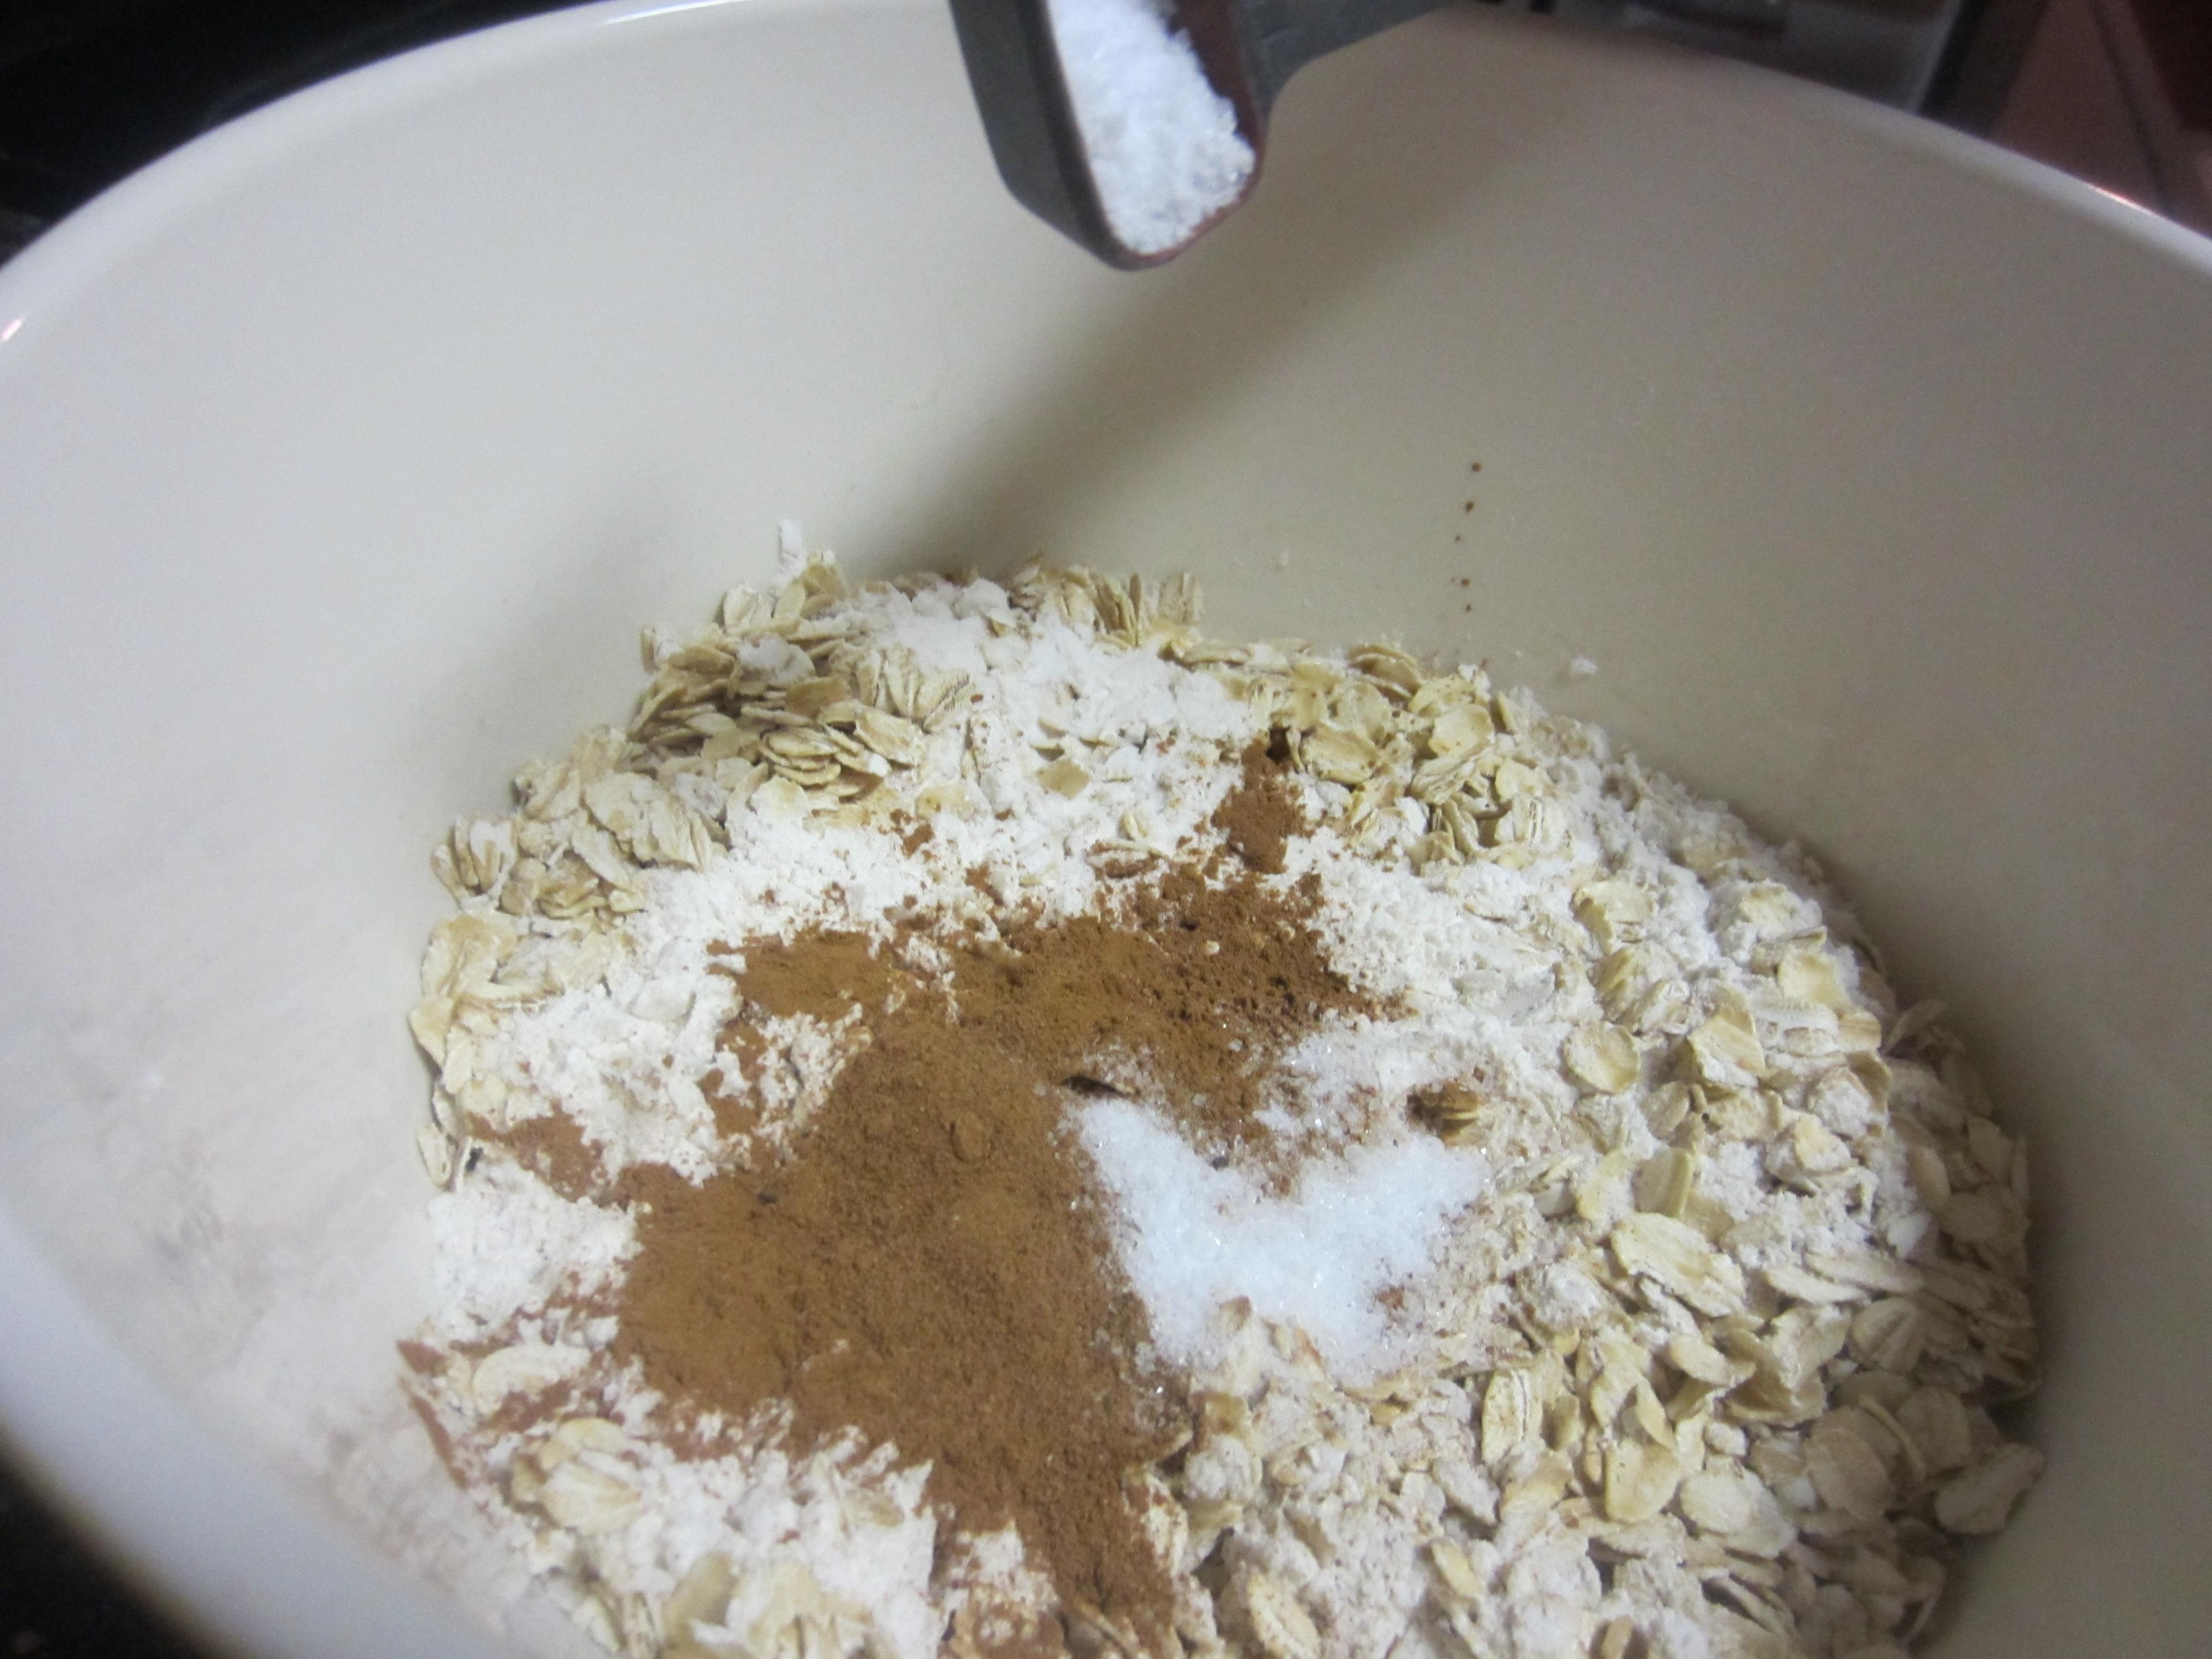 Add cinnamon